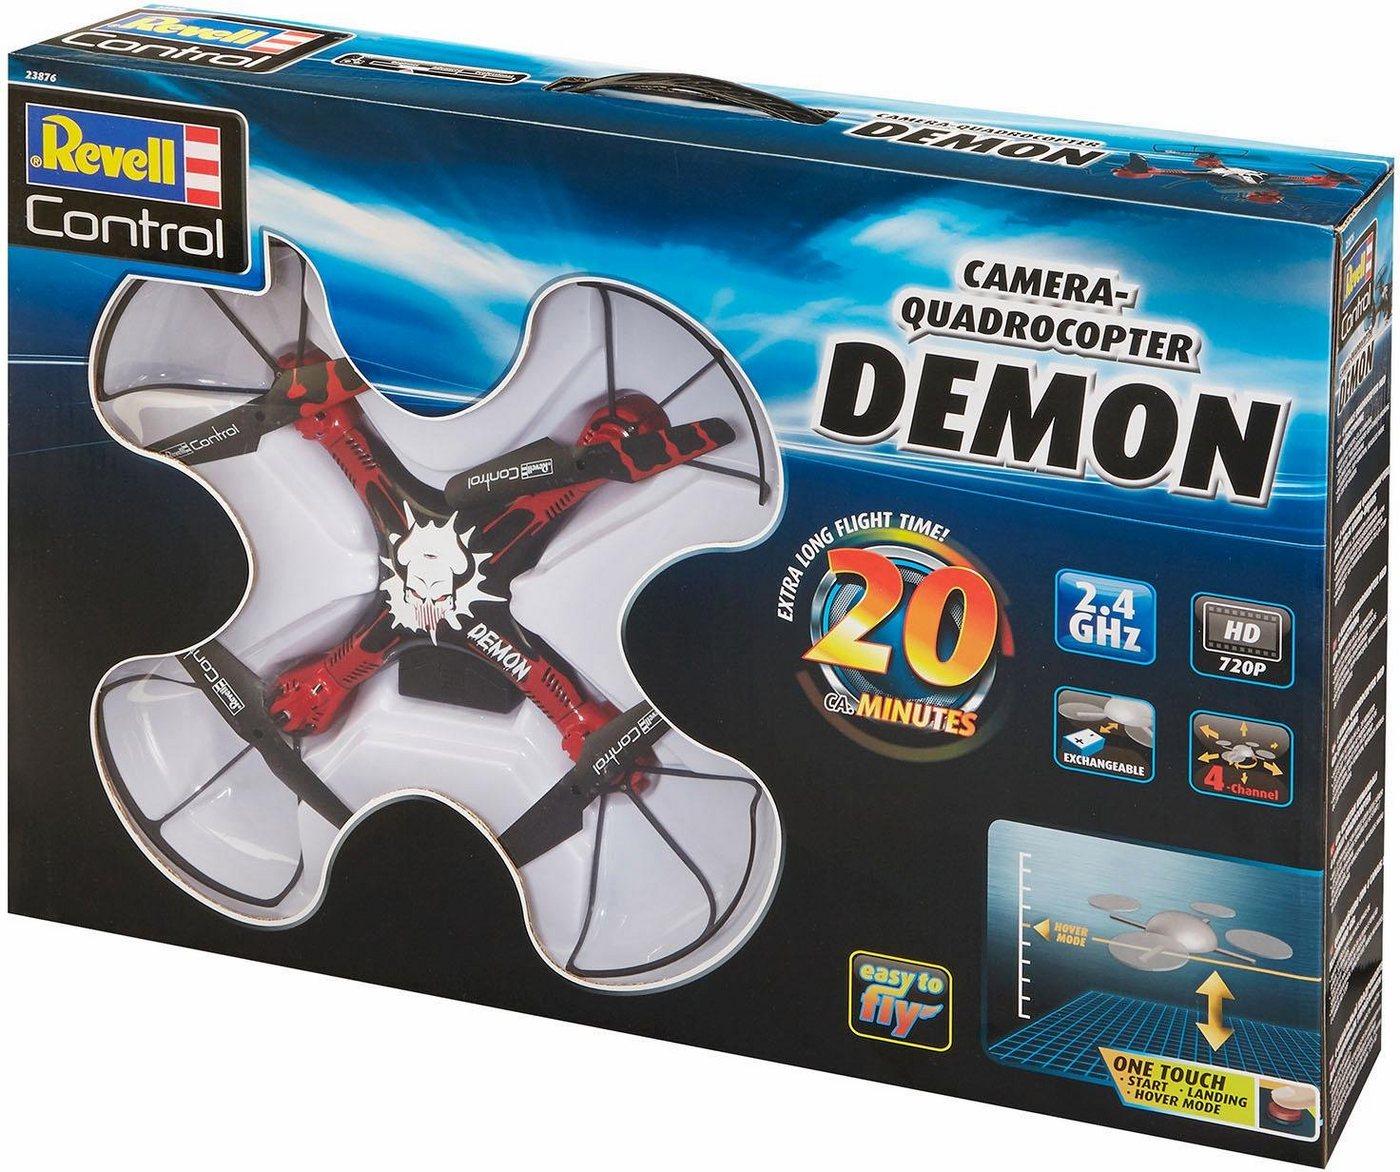 RC Drohne Revell® control Demon mit Kamera*